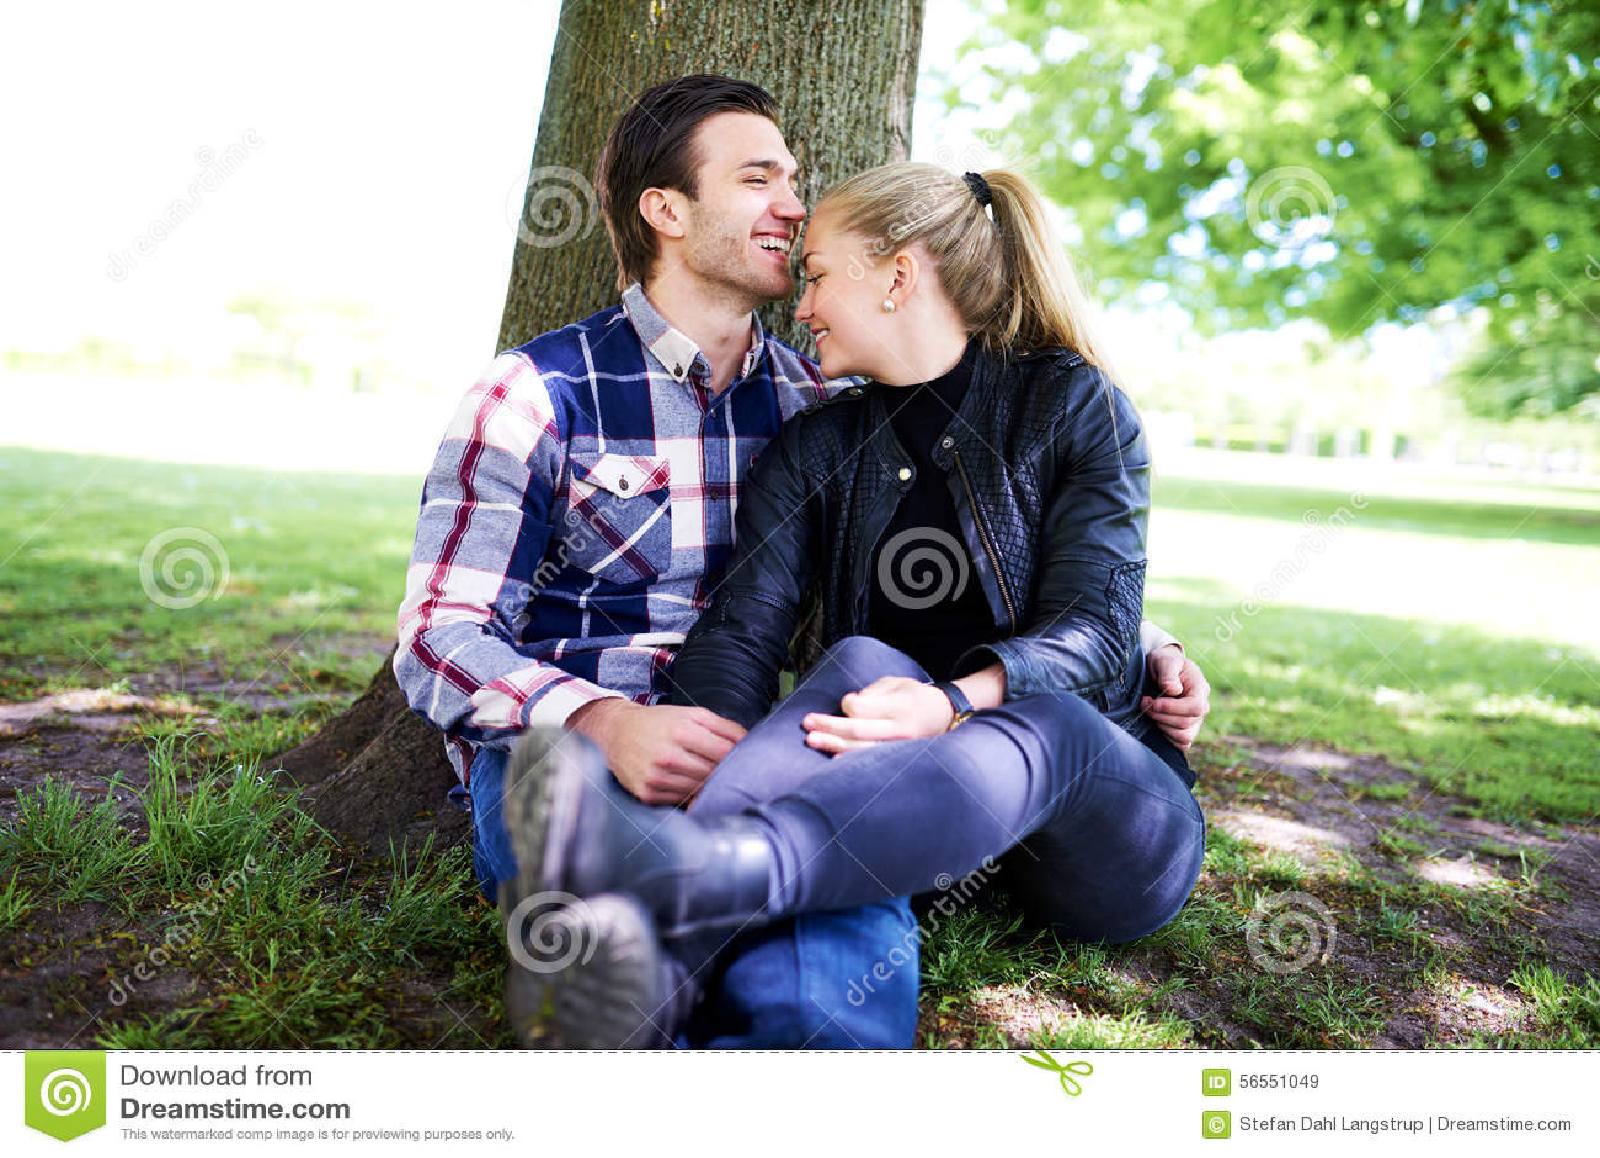 Download Ρομαντικό νέο ζεύγος που απολαμβάνει μια οικεία στιγμή Στοκ Εικόνα - εικόνα από φίλοι, συναδελφικότητα: 56551049